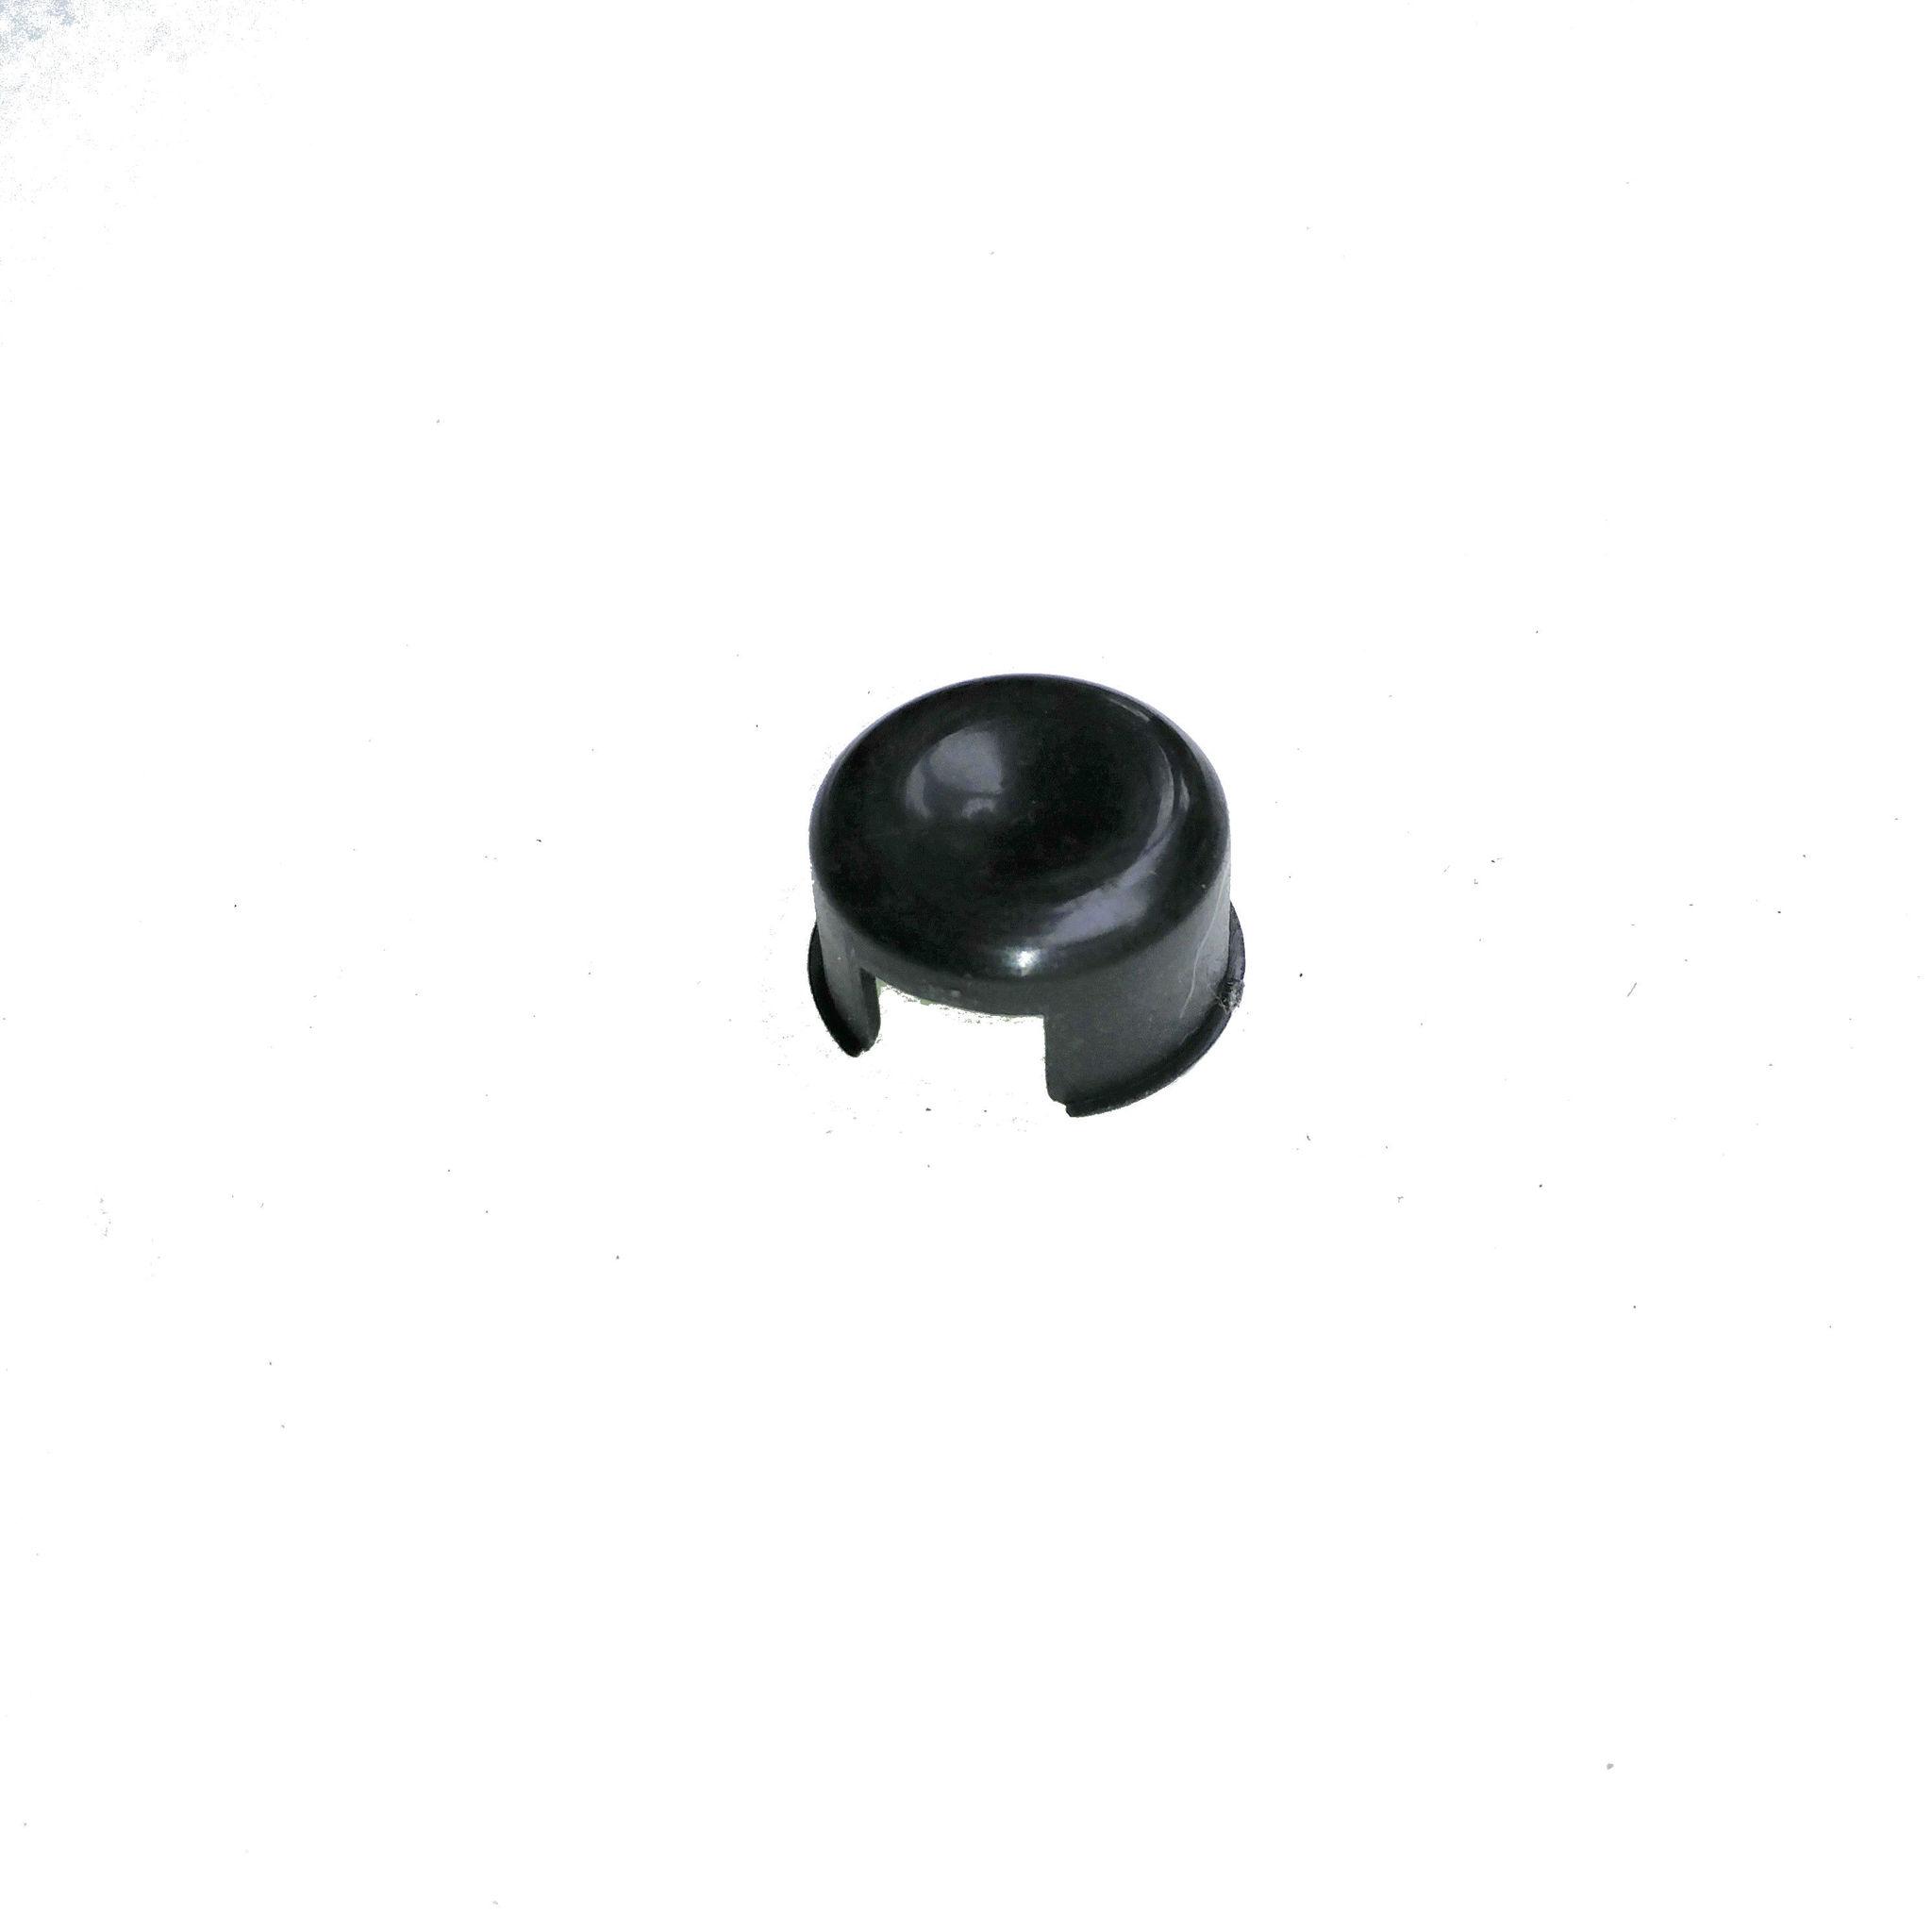 Кнопки регуляторов ручек Кнопка 25,5 мм 20160918_100321.jpg